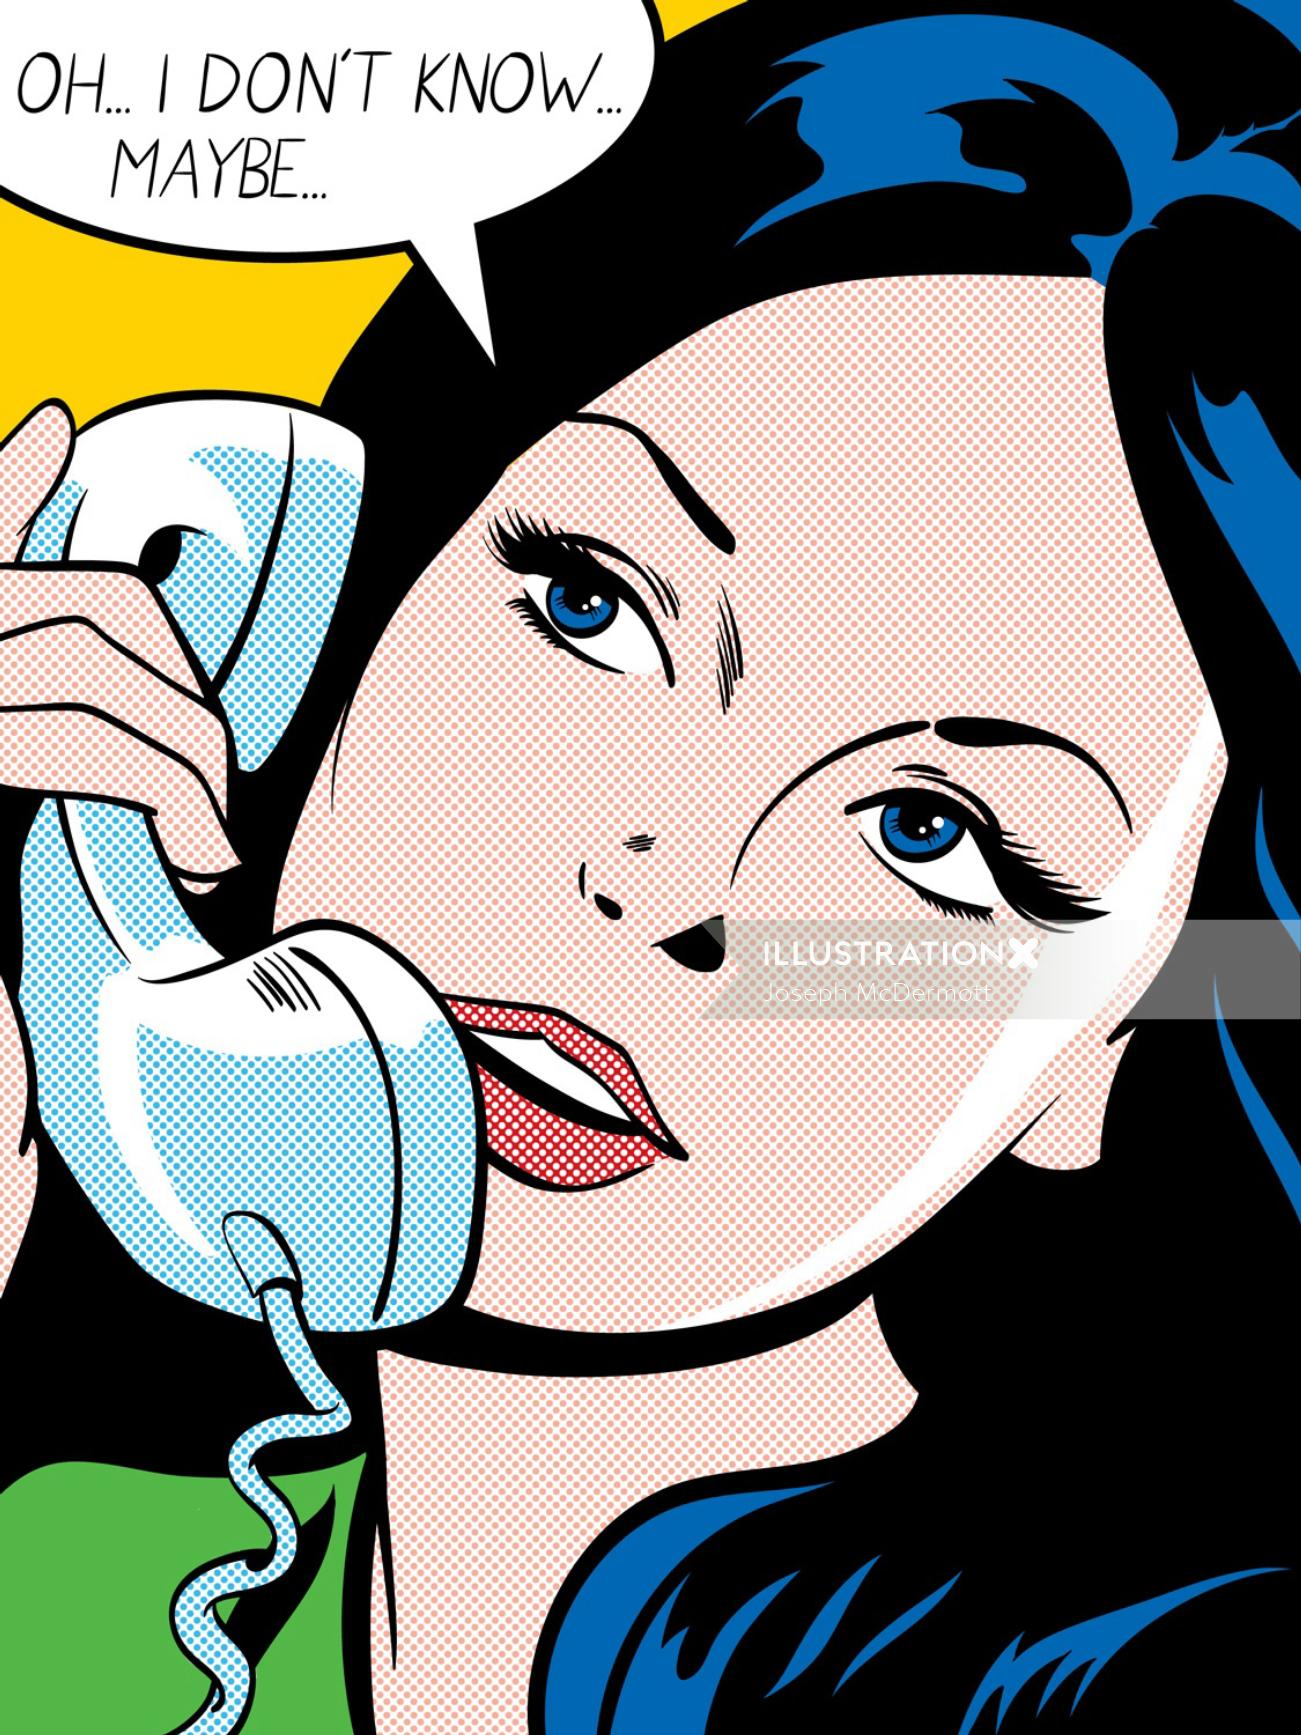 Illustration of conversational comic